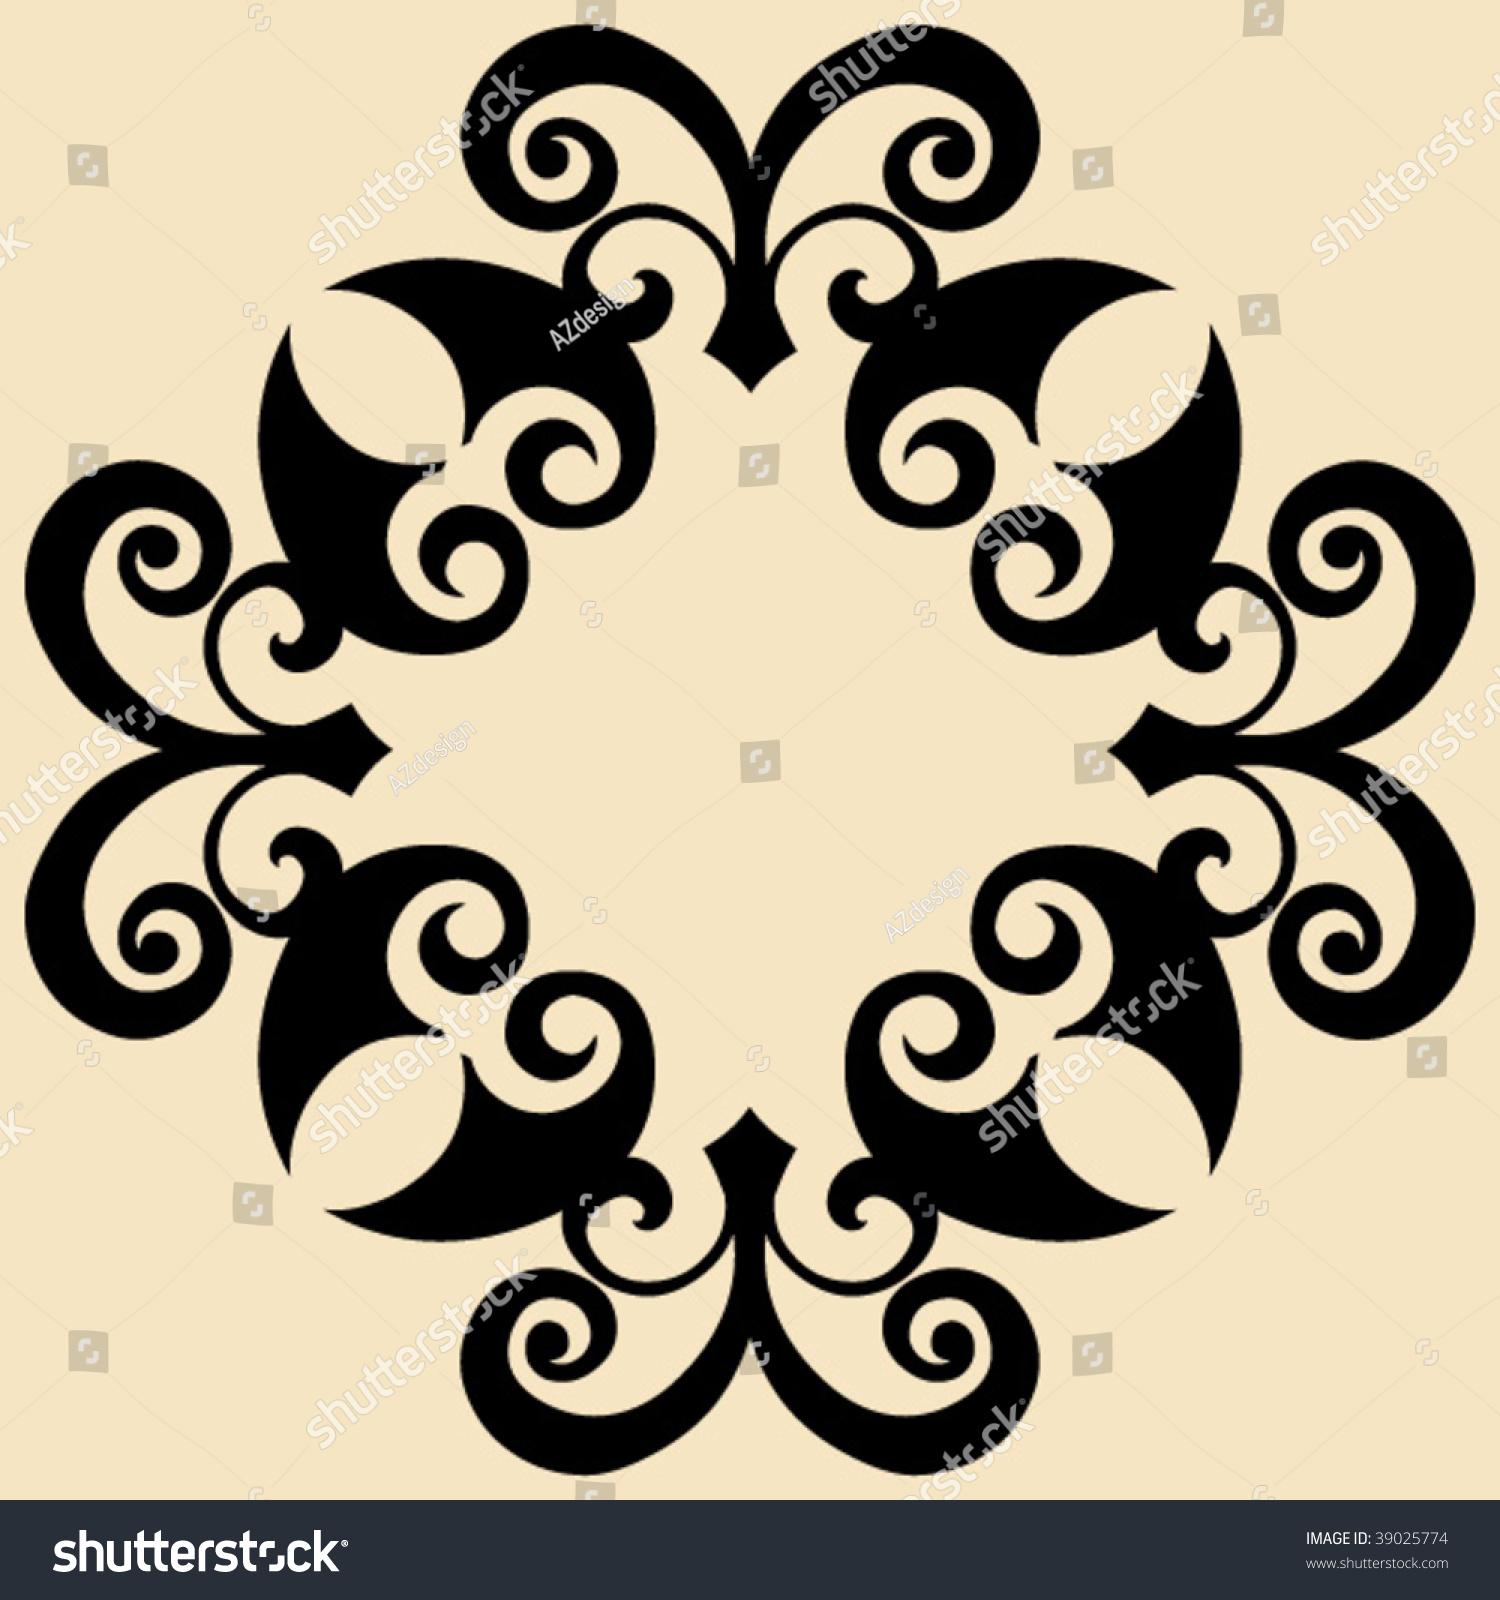 Baroque design element decorative vector ornament for Baroque design elements